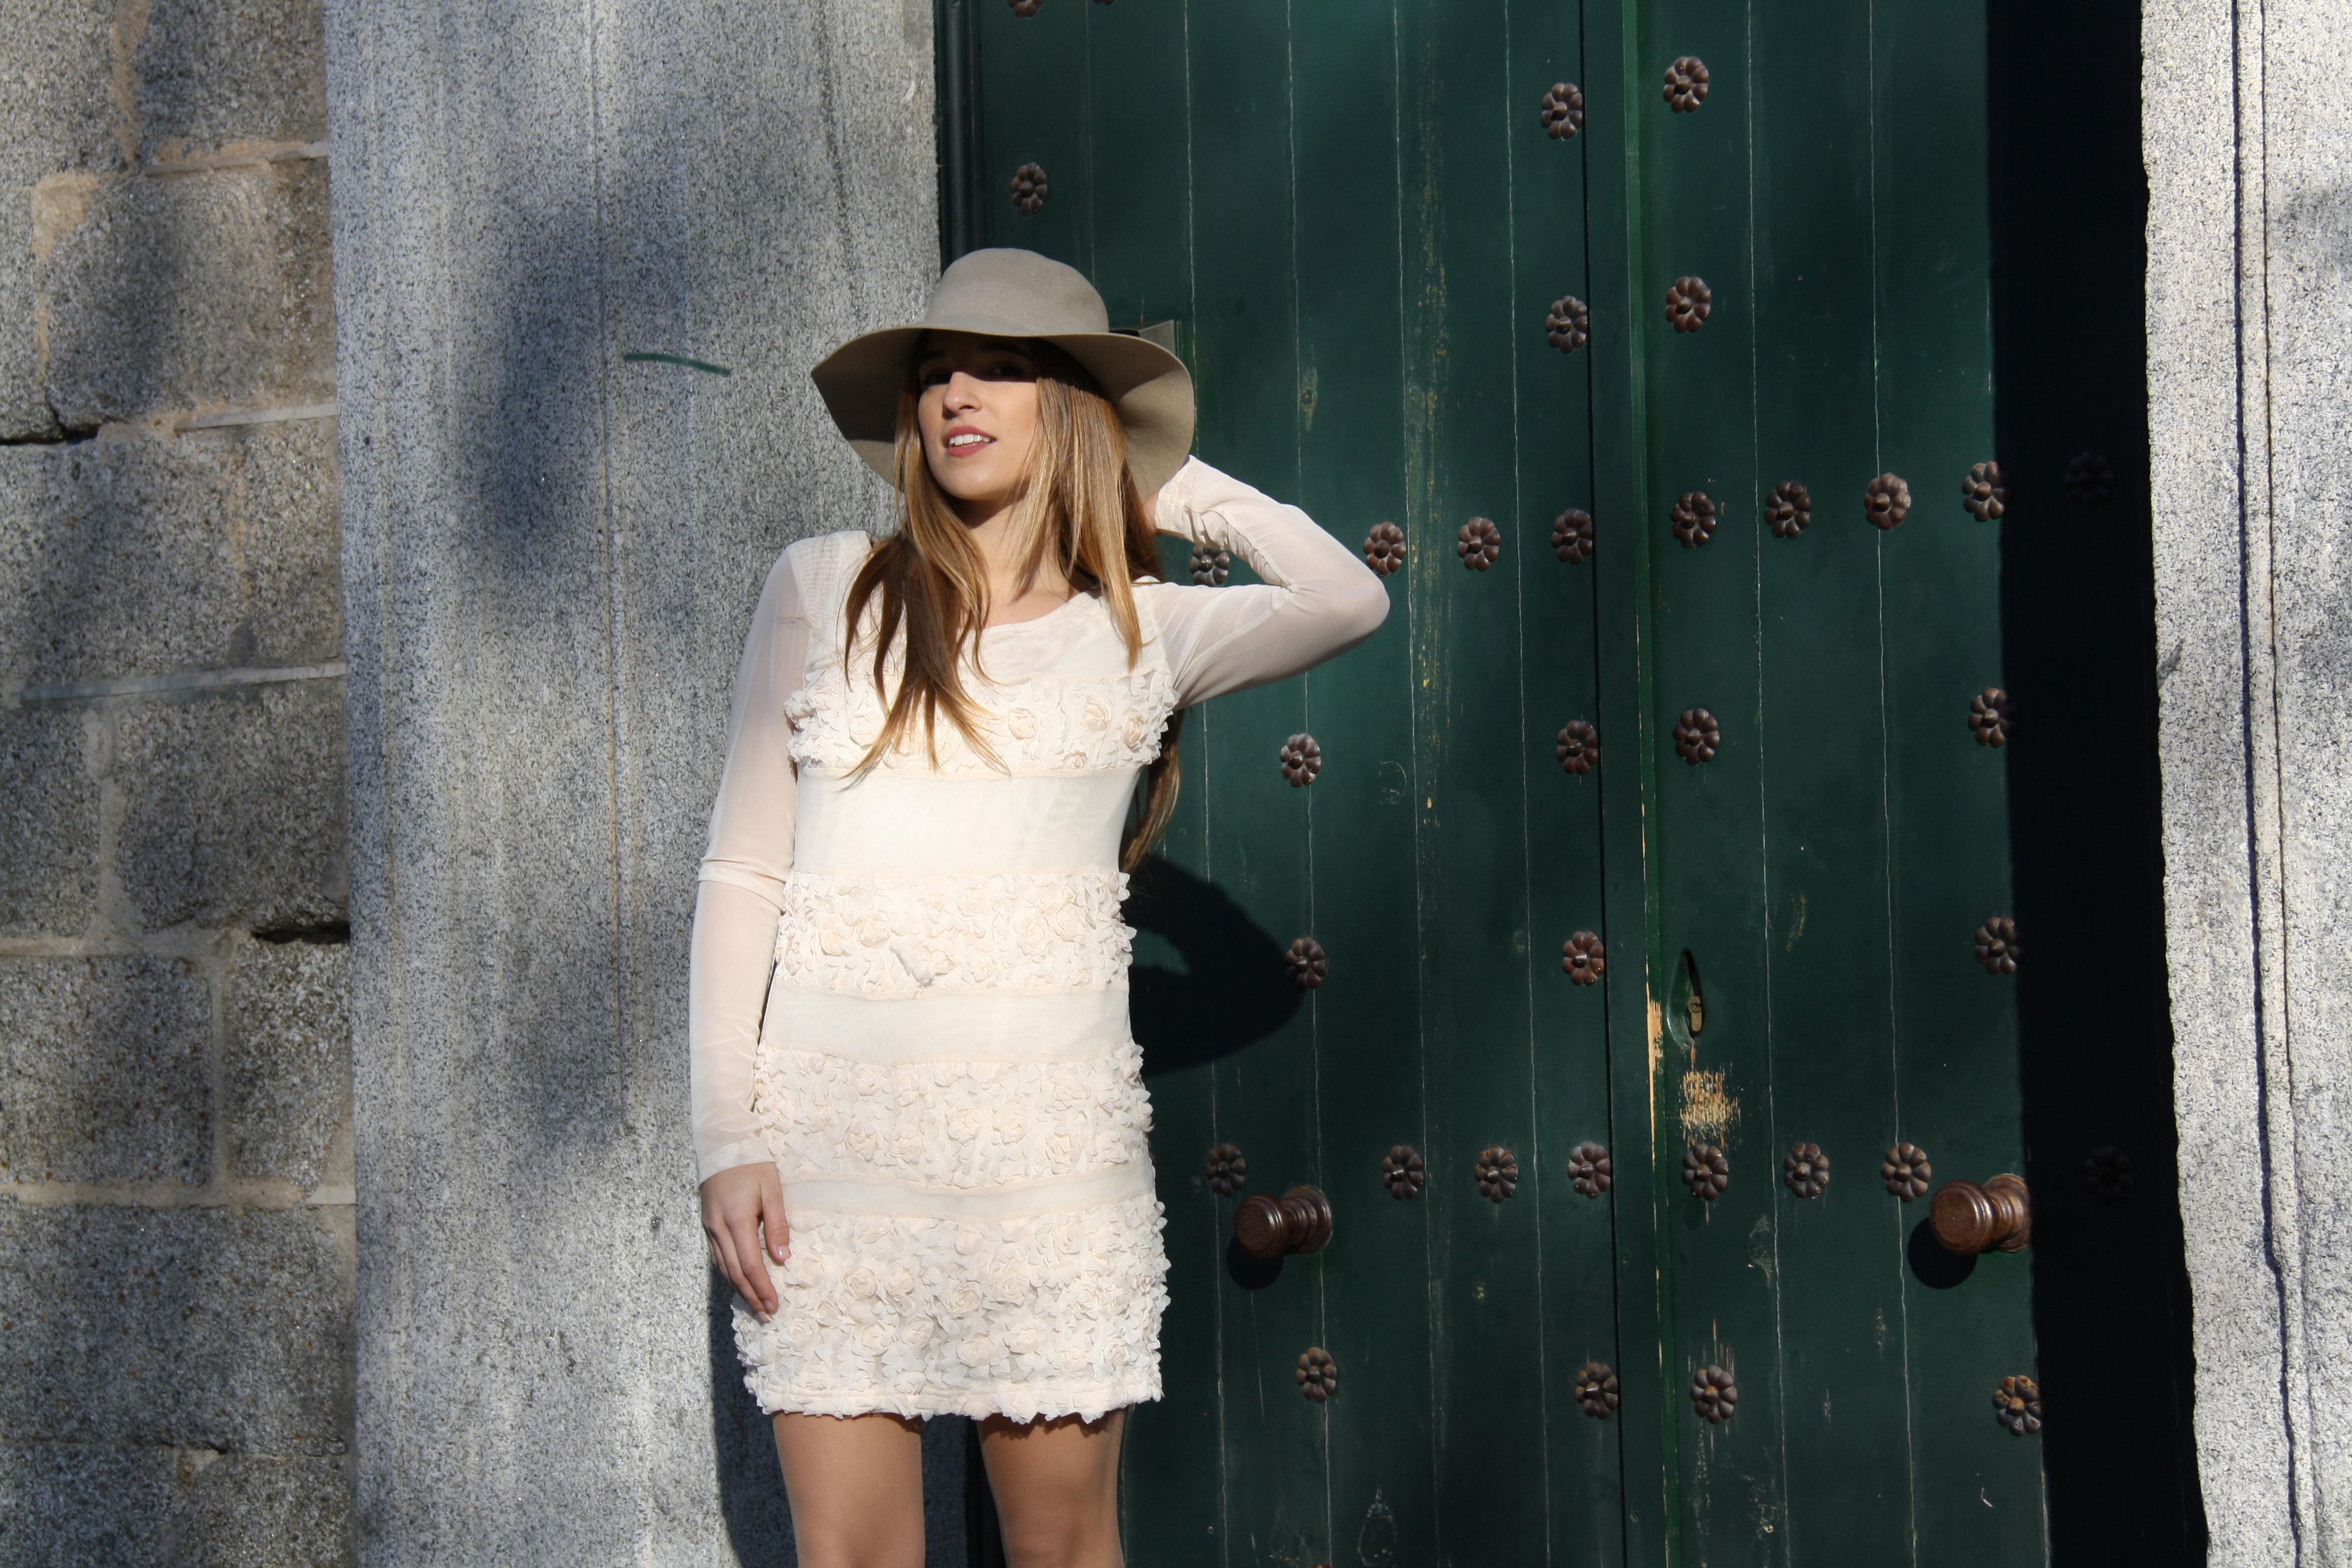 Comprar ropa online mujer barata